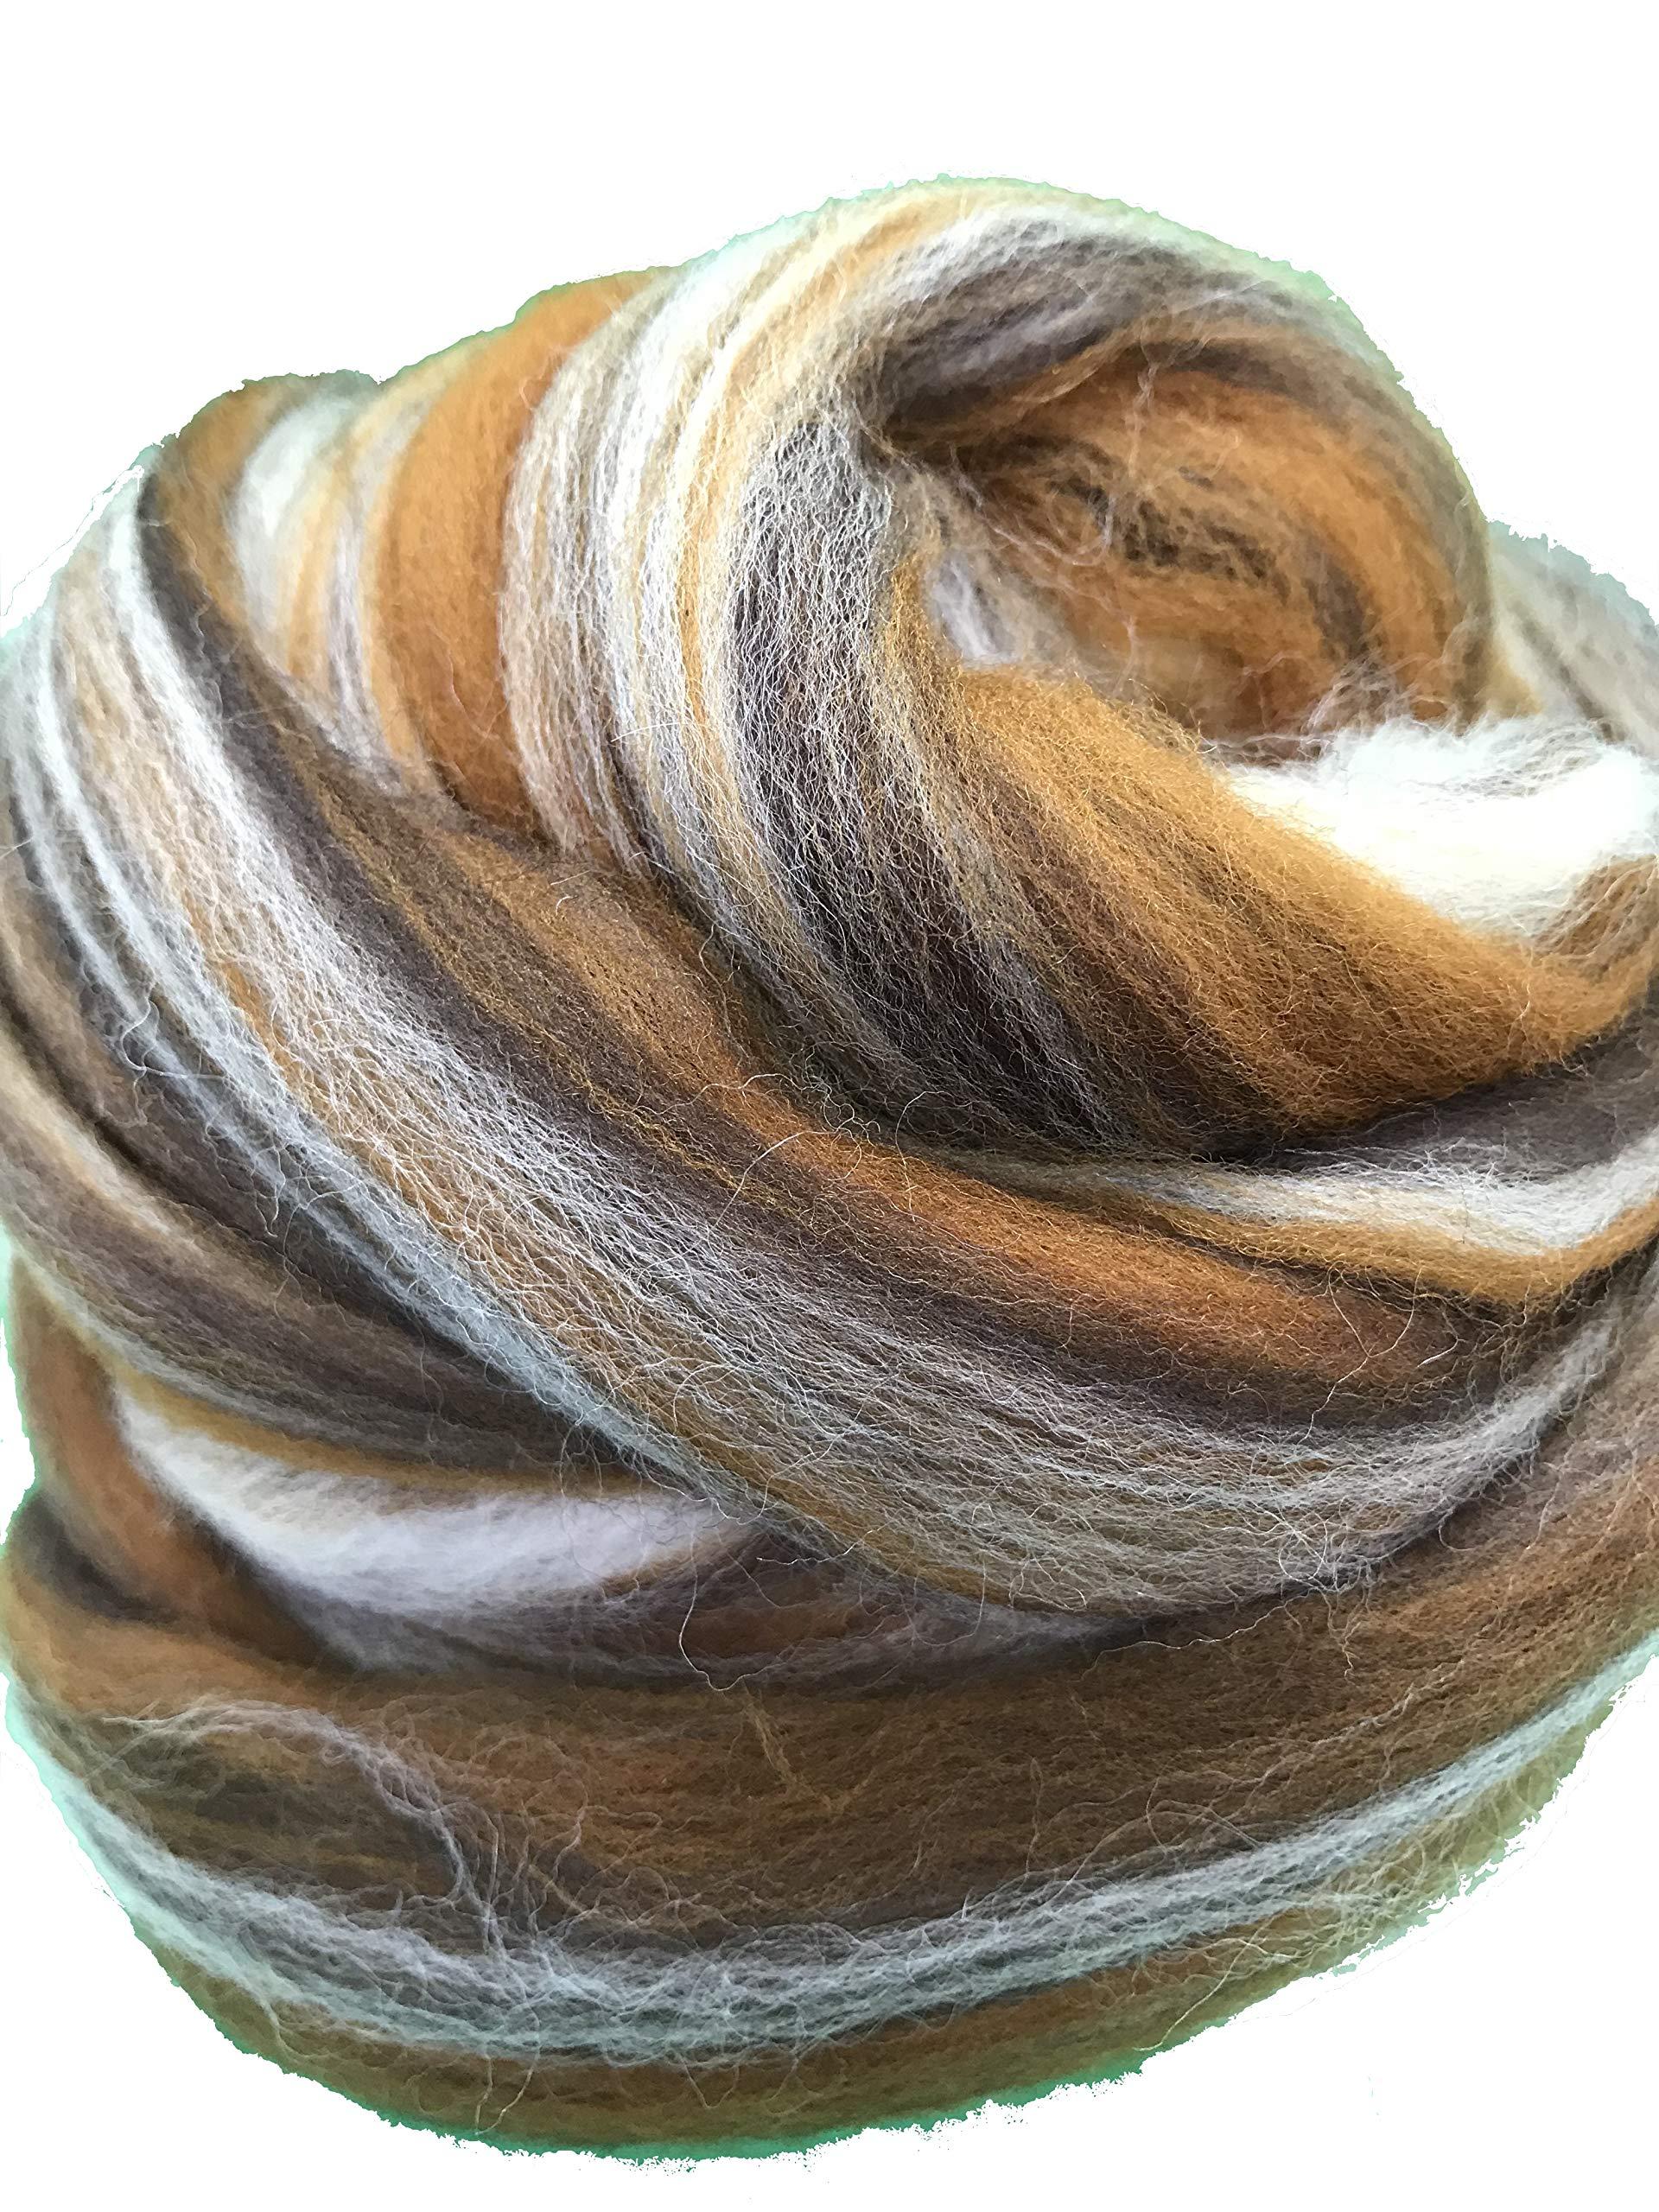 Shep's Cafe Latte Merino Wool Top Roving Fiber Spinning, Felting Crafts USA (2lb) by Shep's Wool